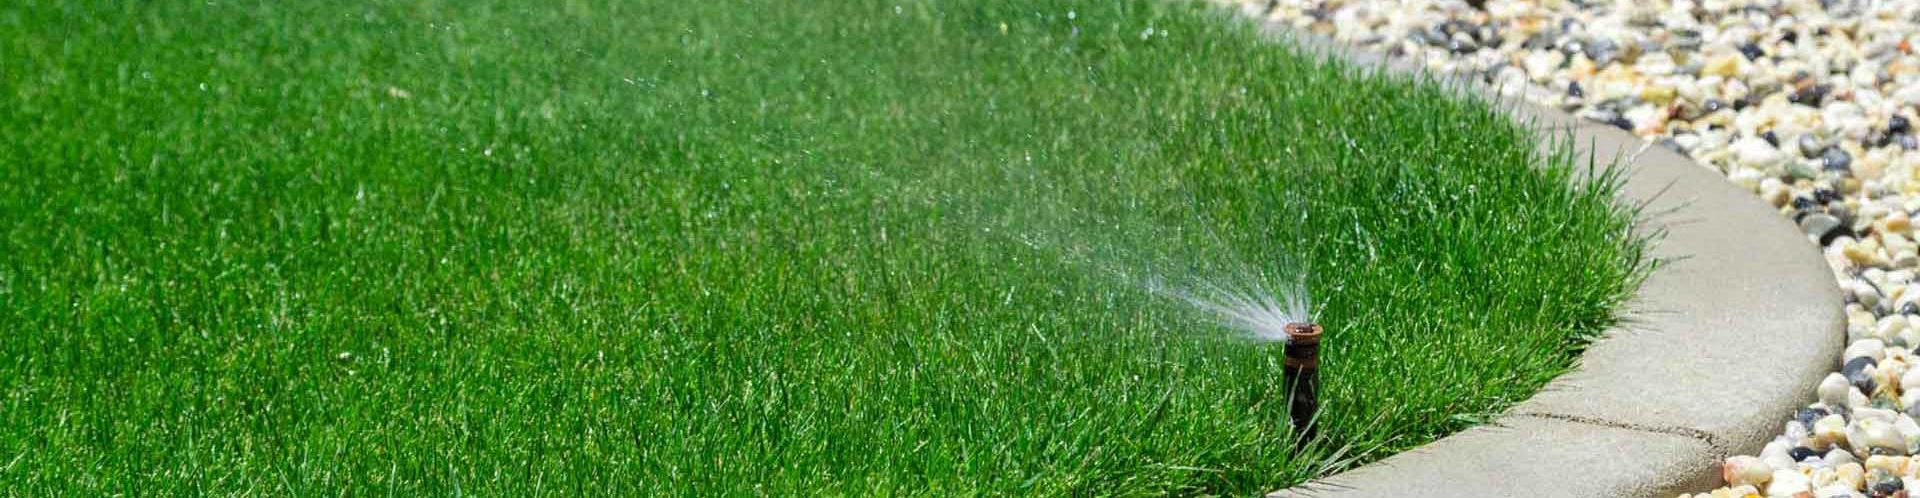 Irrigation-Underground-Sprinkler-Systems-Fargo-ND-Landscaping-e1491317858155-1